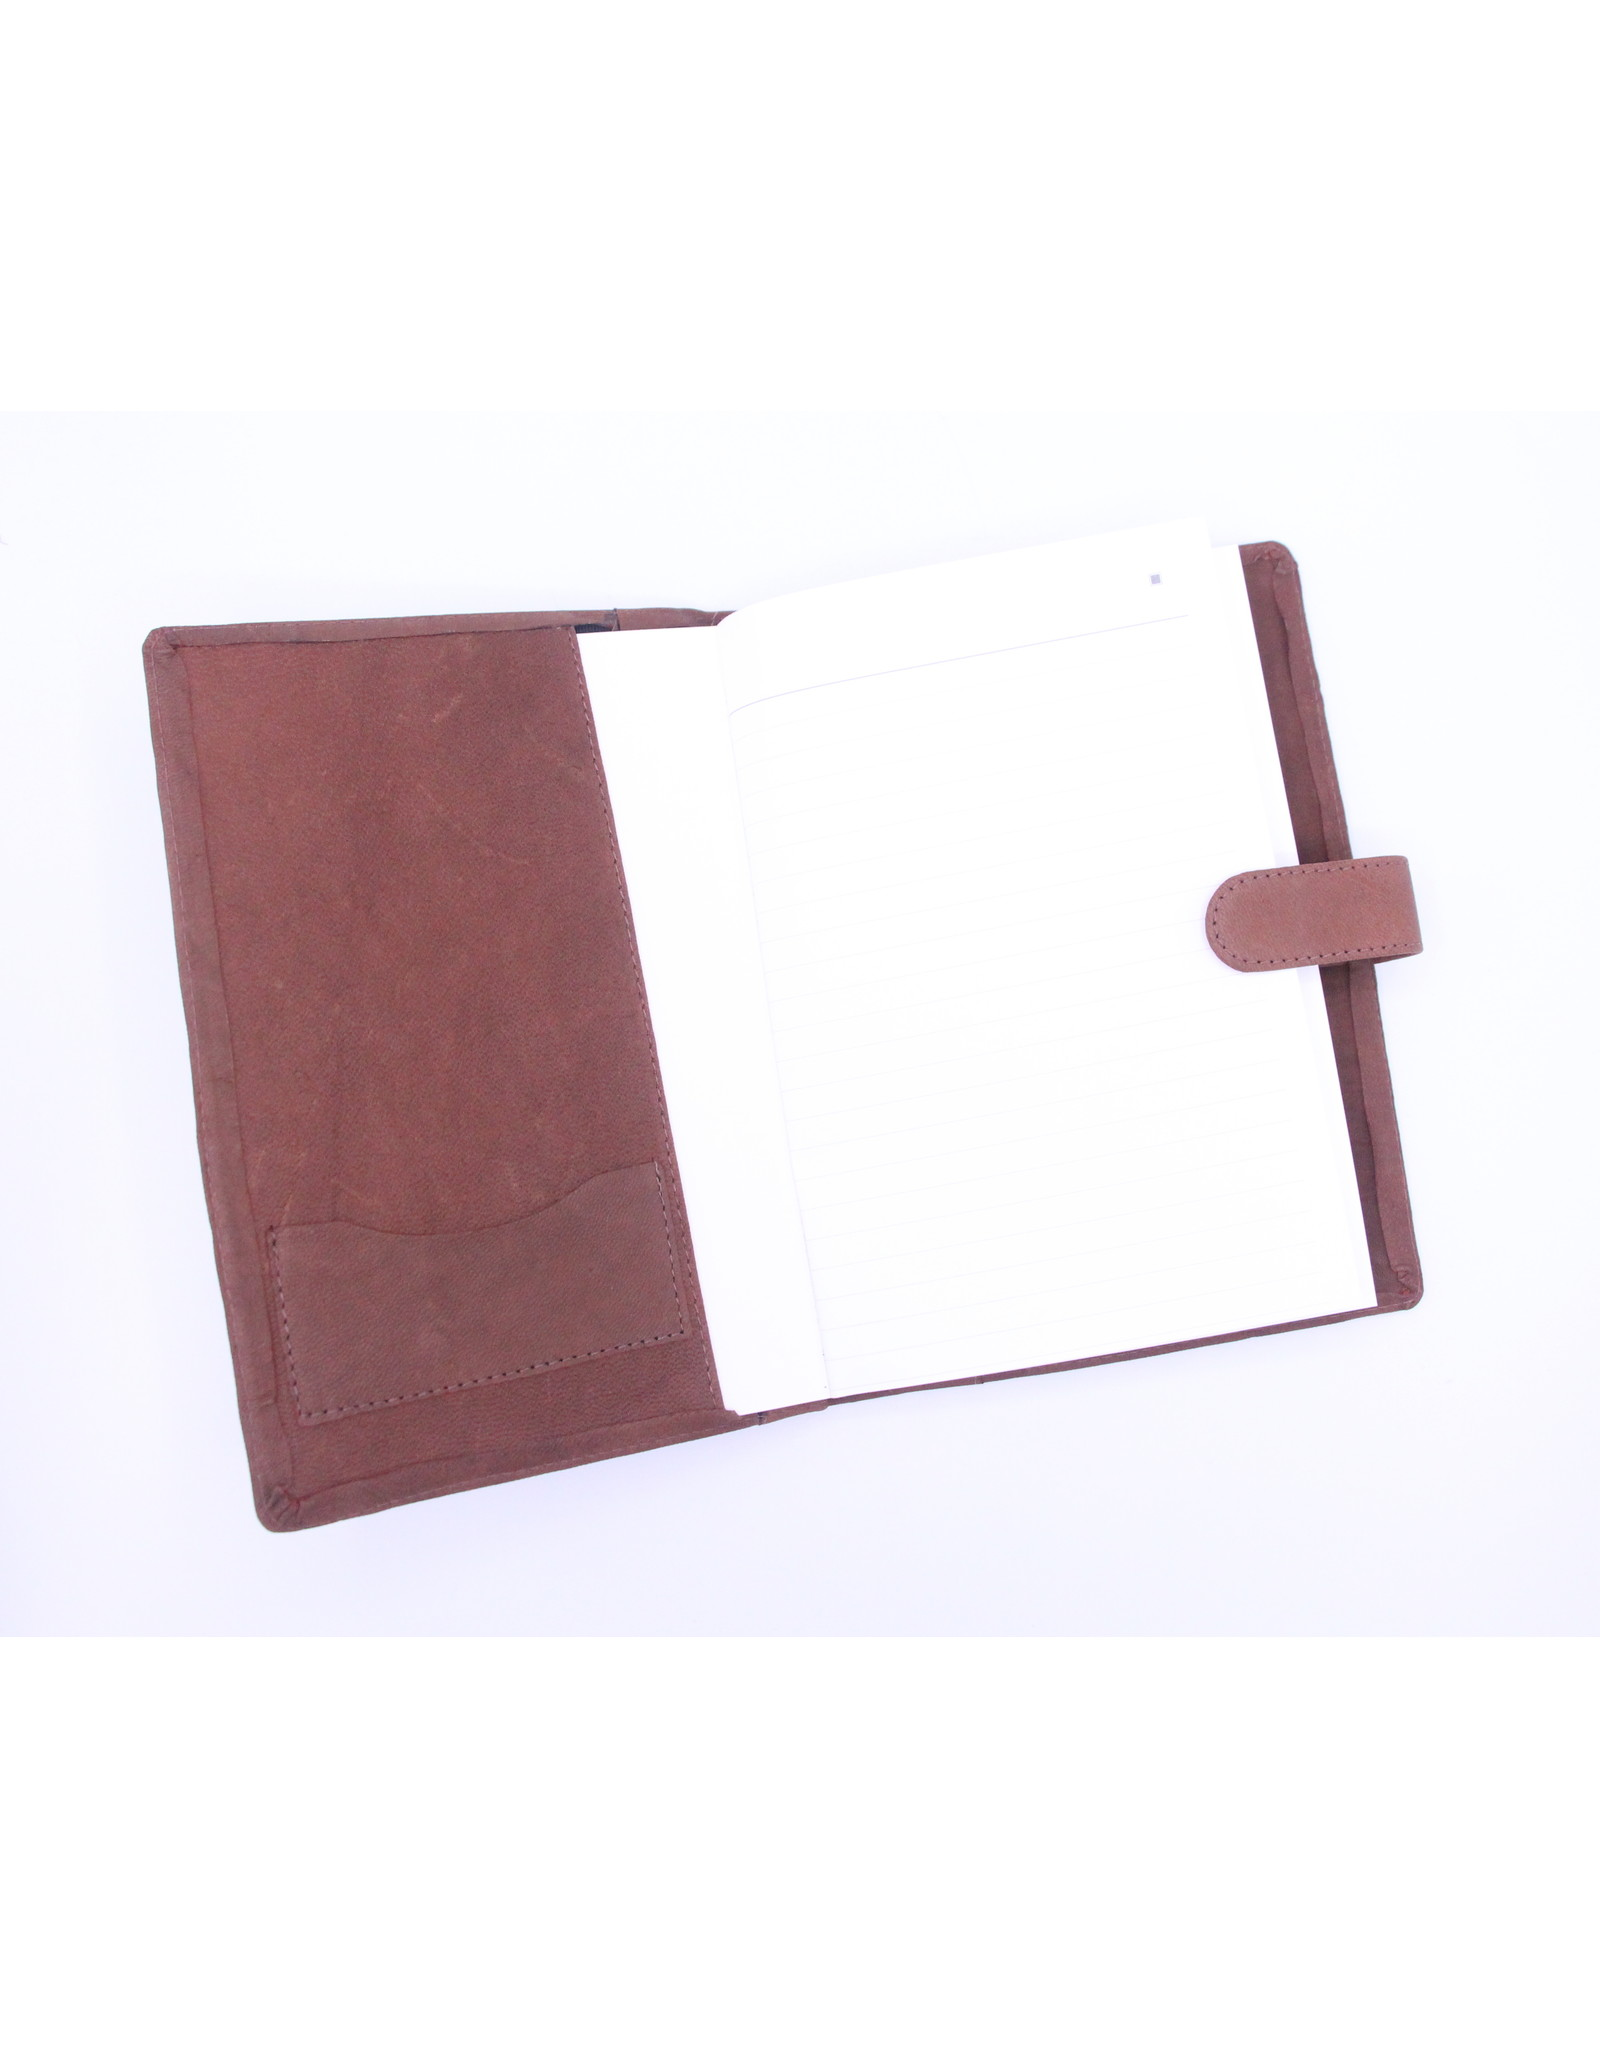 57069 Sealskin Journal with Insert